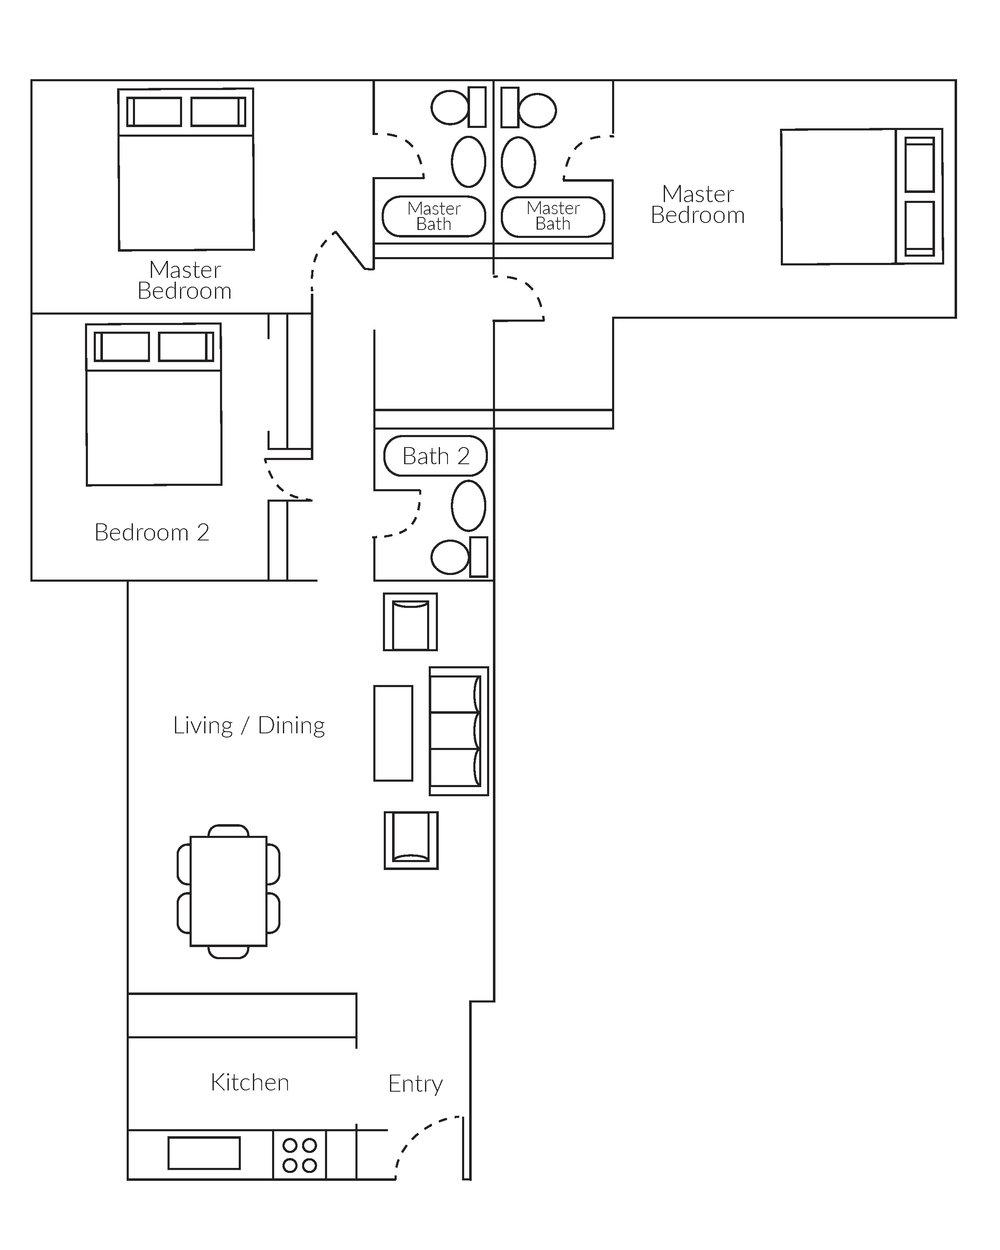 3 bedroom, 3 bathrom high-rise apartment